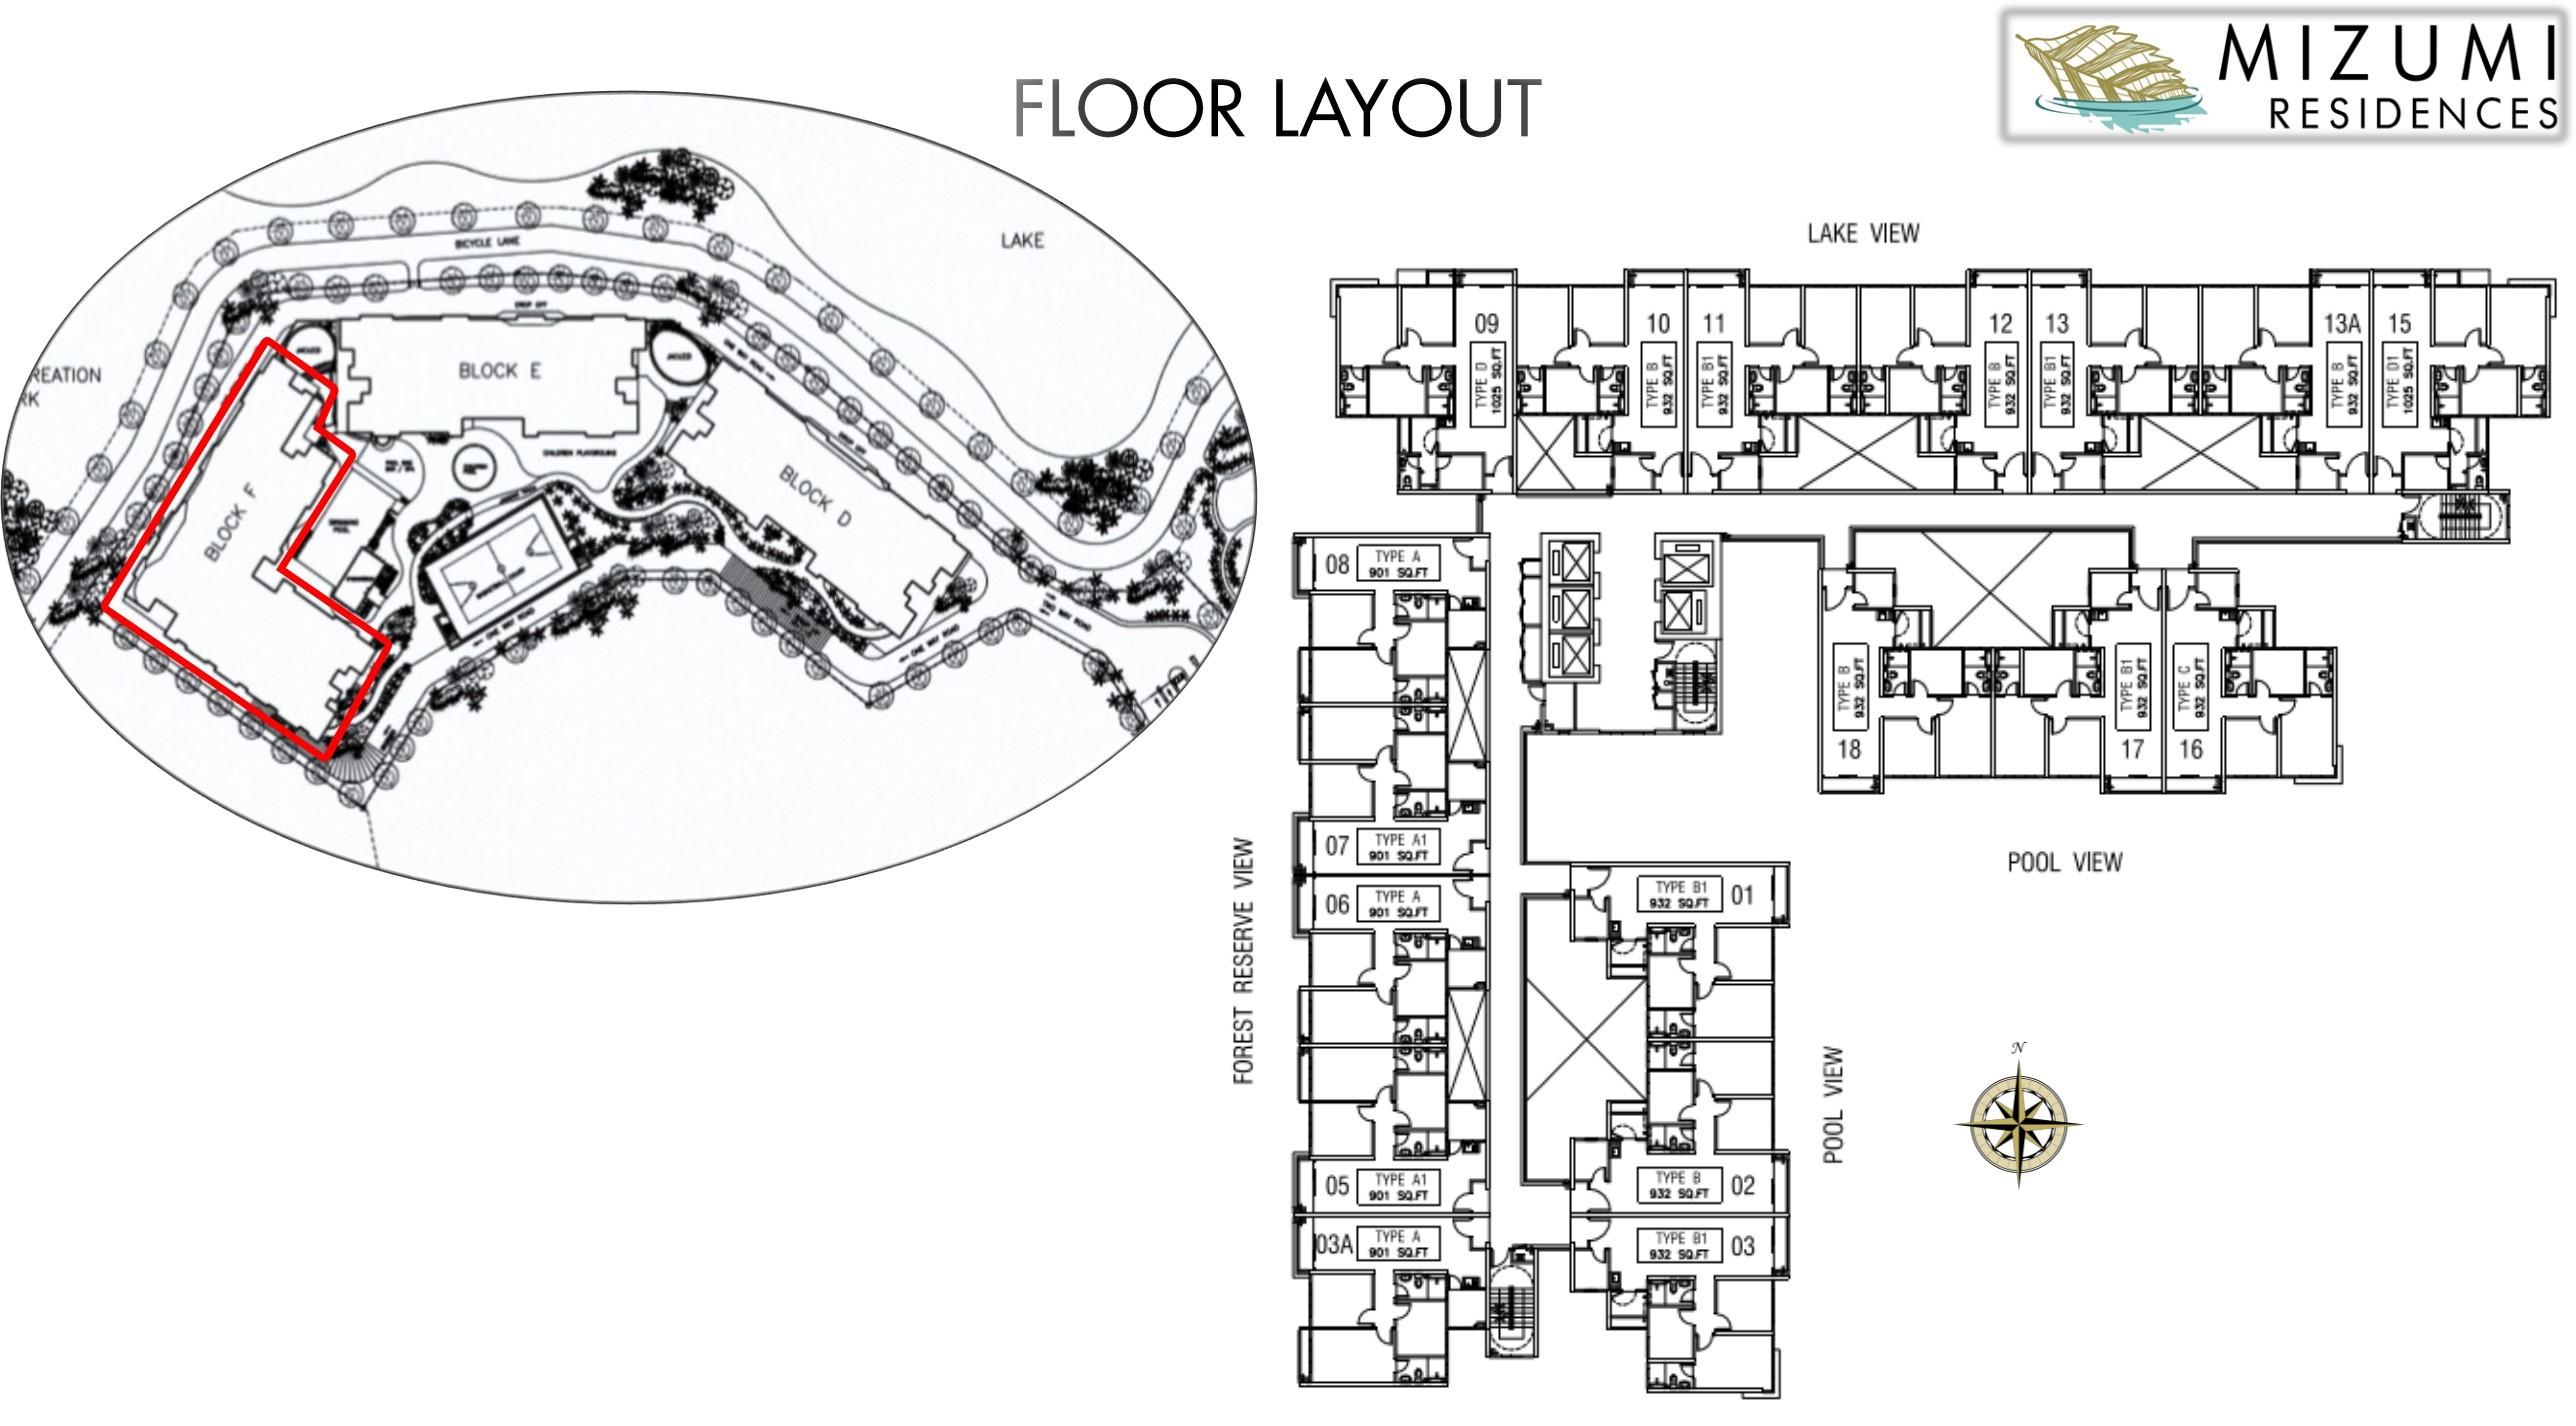 Mizumi Residences